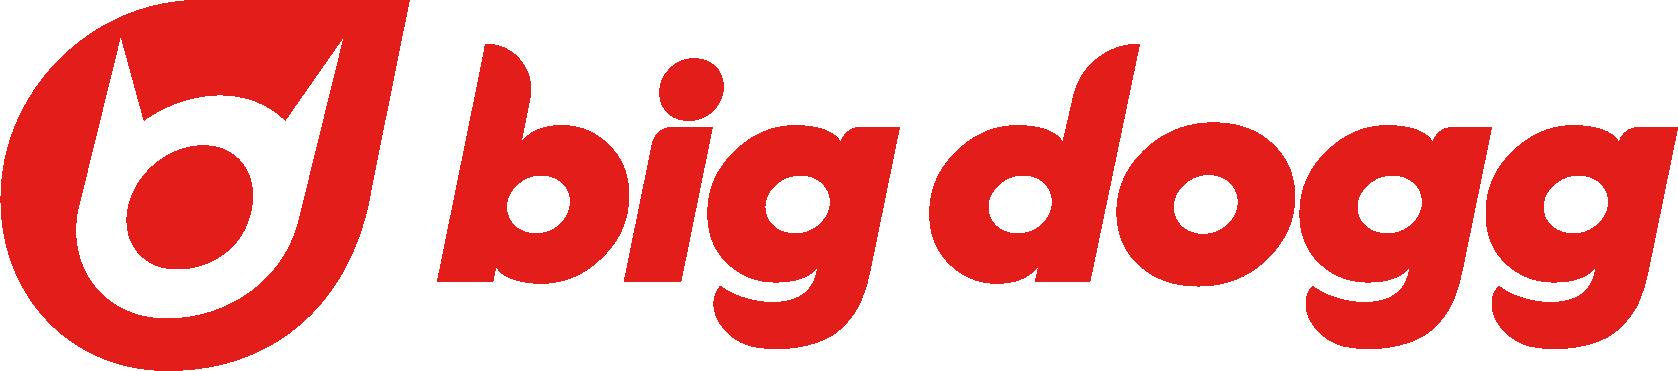 Big Dogg_Logo Device_PMS 485 C.png